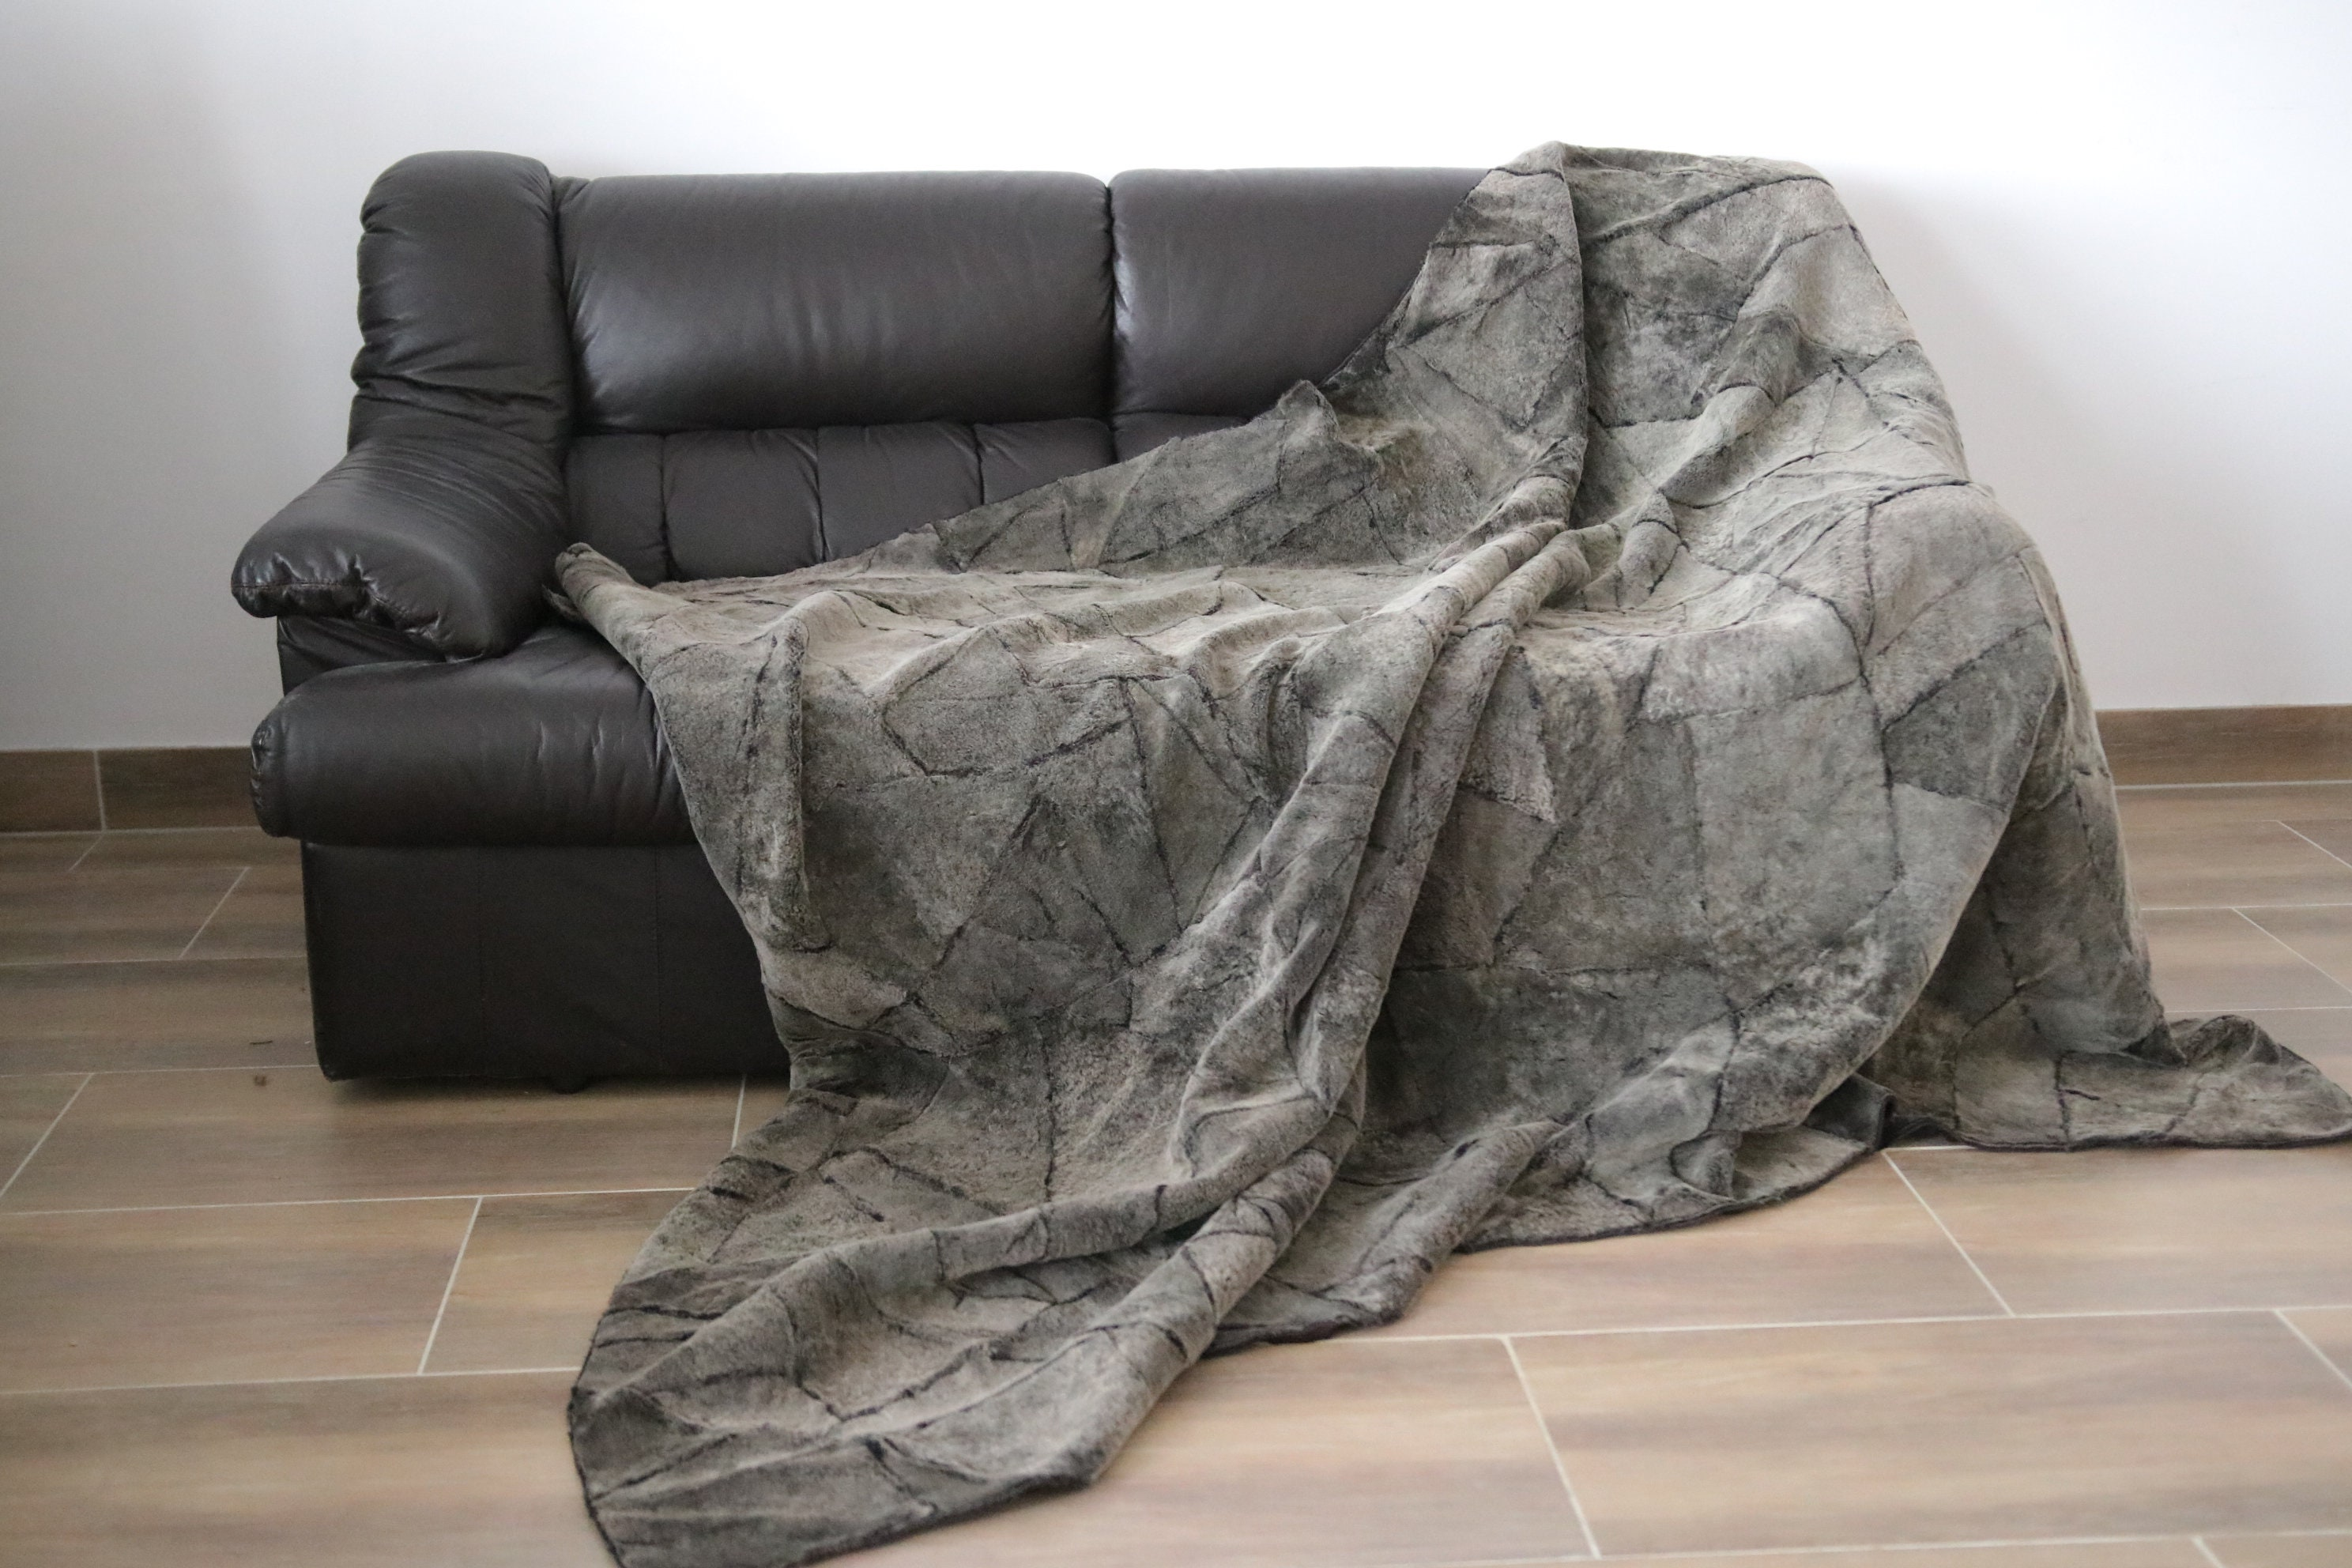 Exclusive Real Gray Sheepskin Blanket Throw, Fur Sofa Throw, Scandinavian  Decoration, Throws For Sofa, Sofa Throws, Luxury Throws